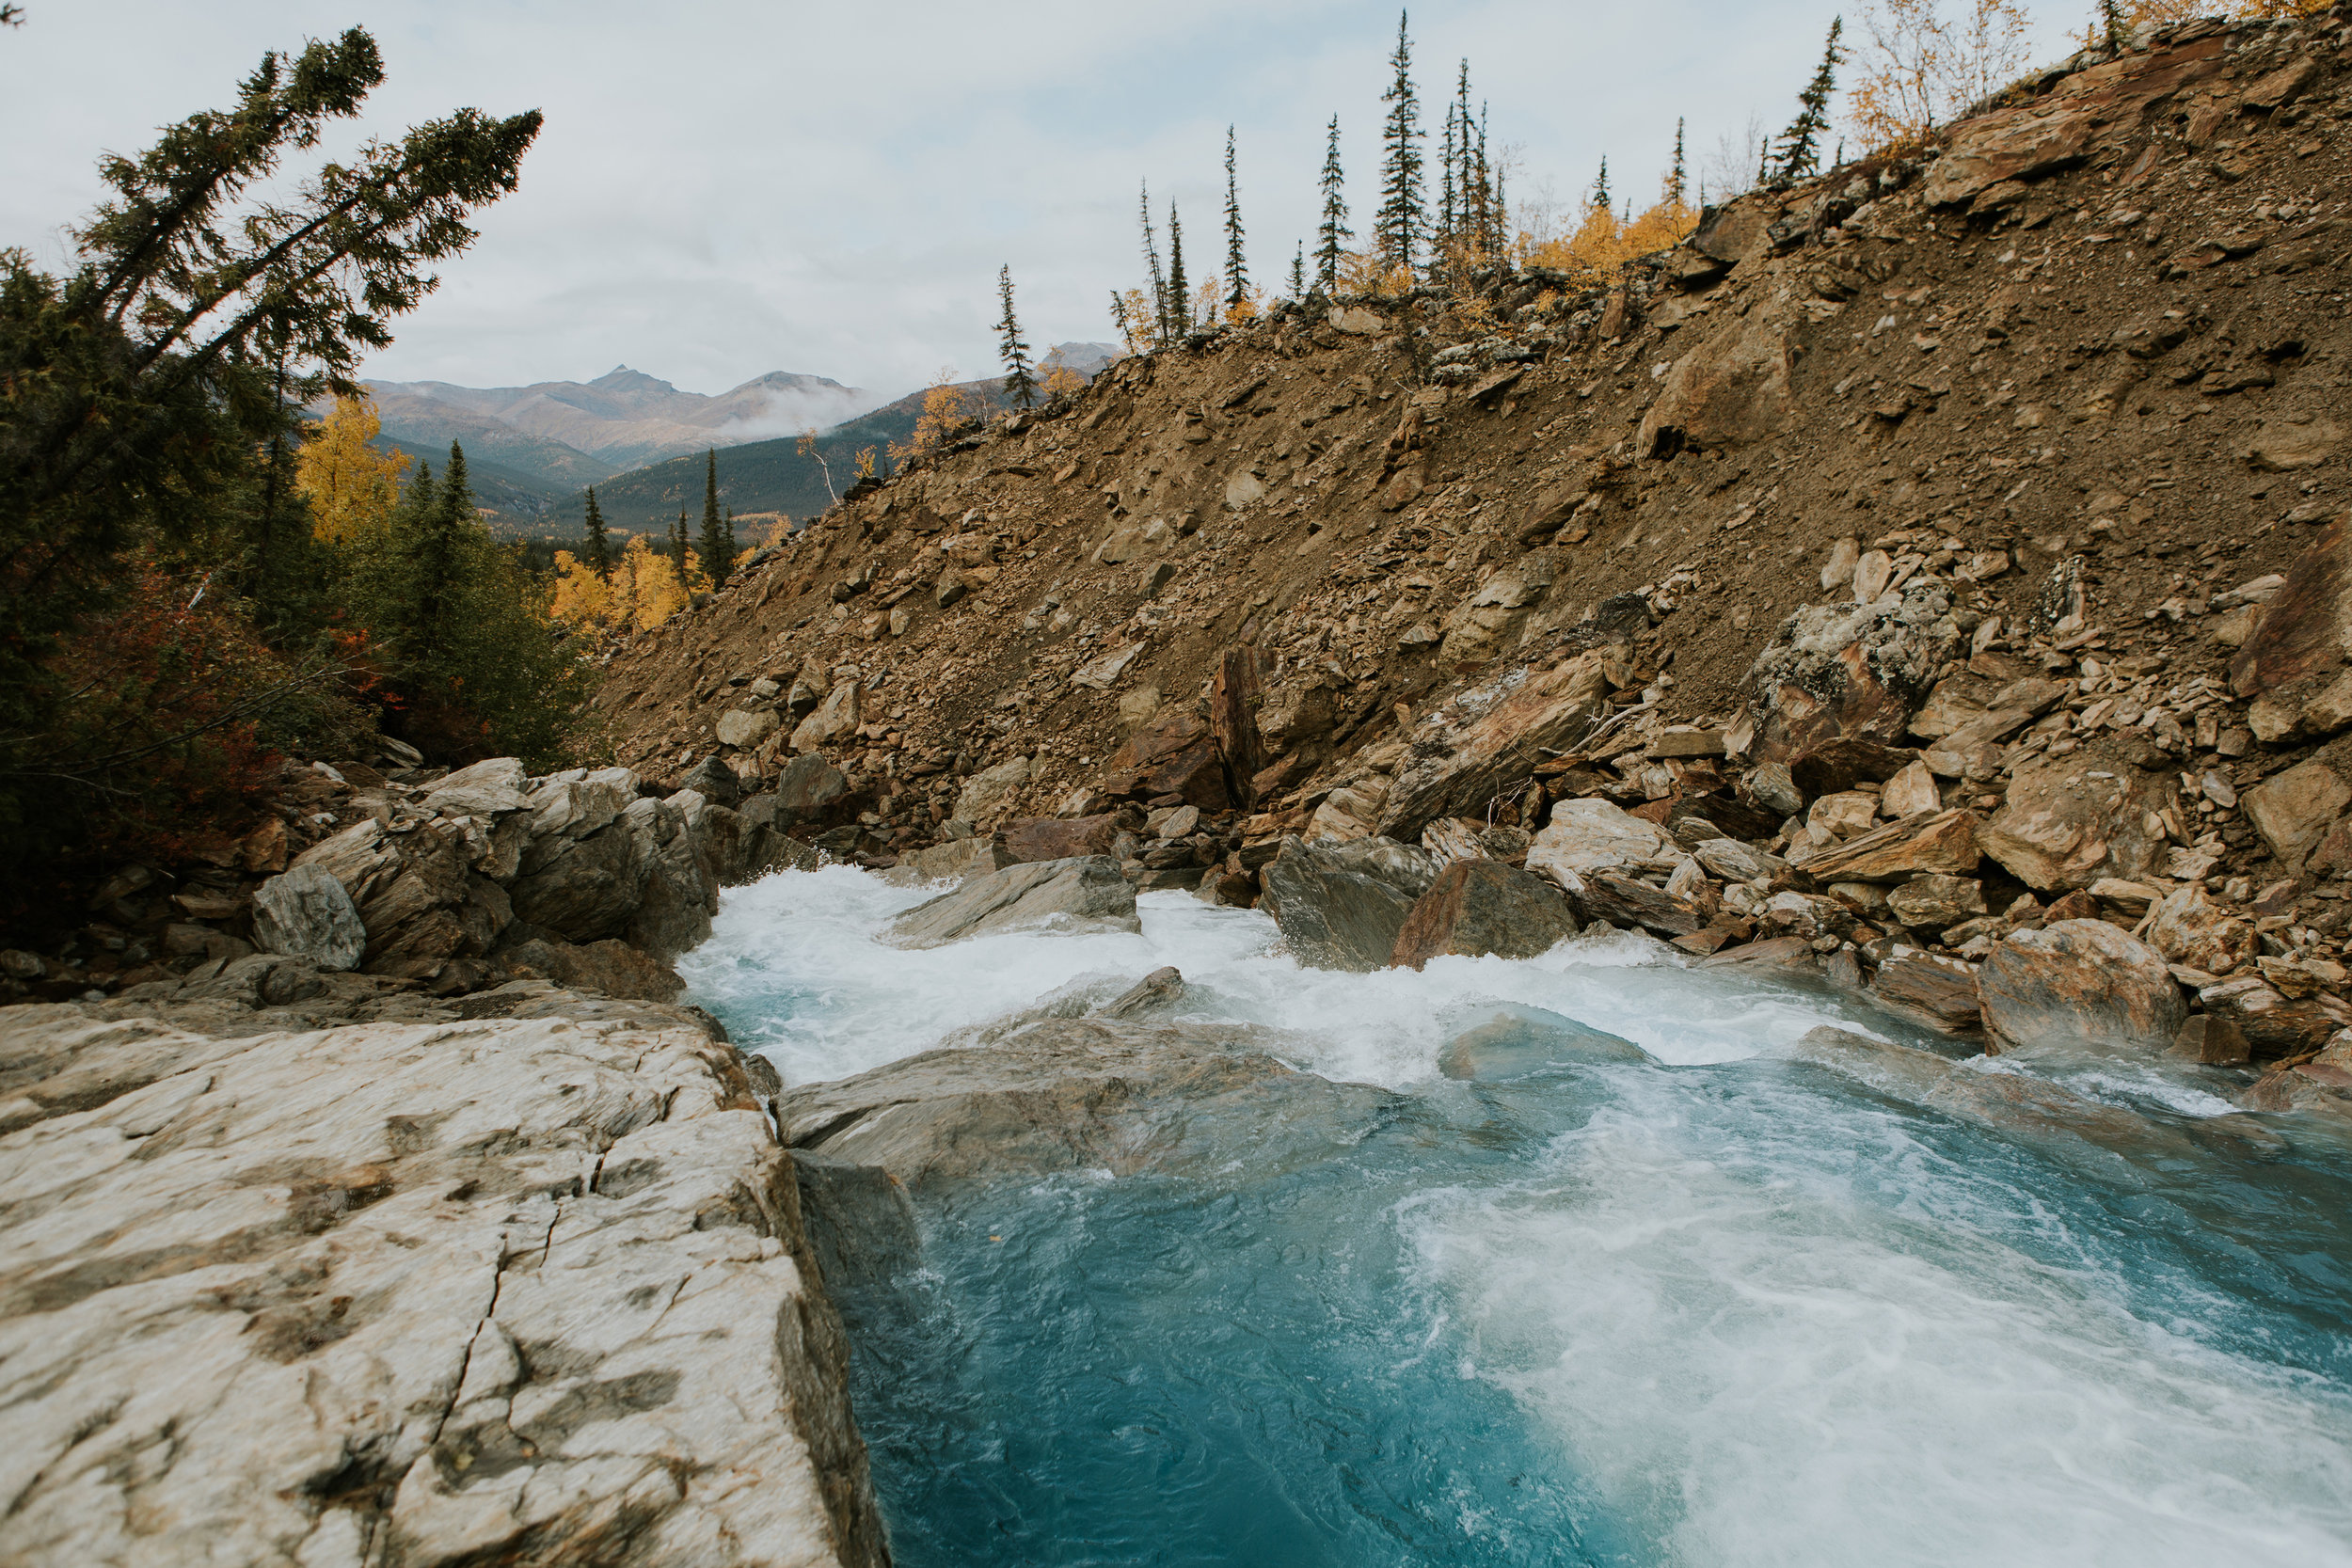 CindyGiovagnoli_Alaska_KoyukukRiver_SukakpakMountain_JimRiver_ArcticCircle_fly_fishing_September-034.jpg